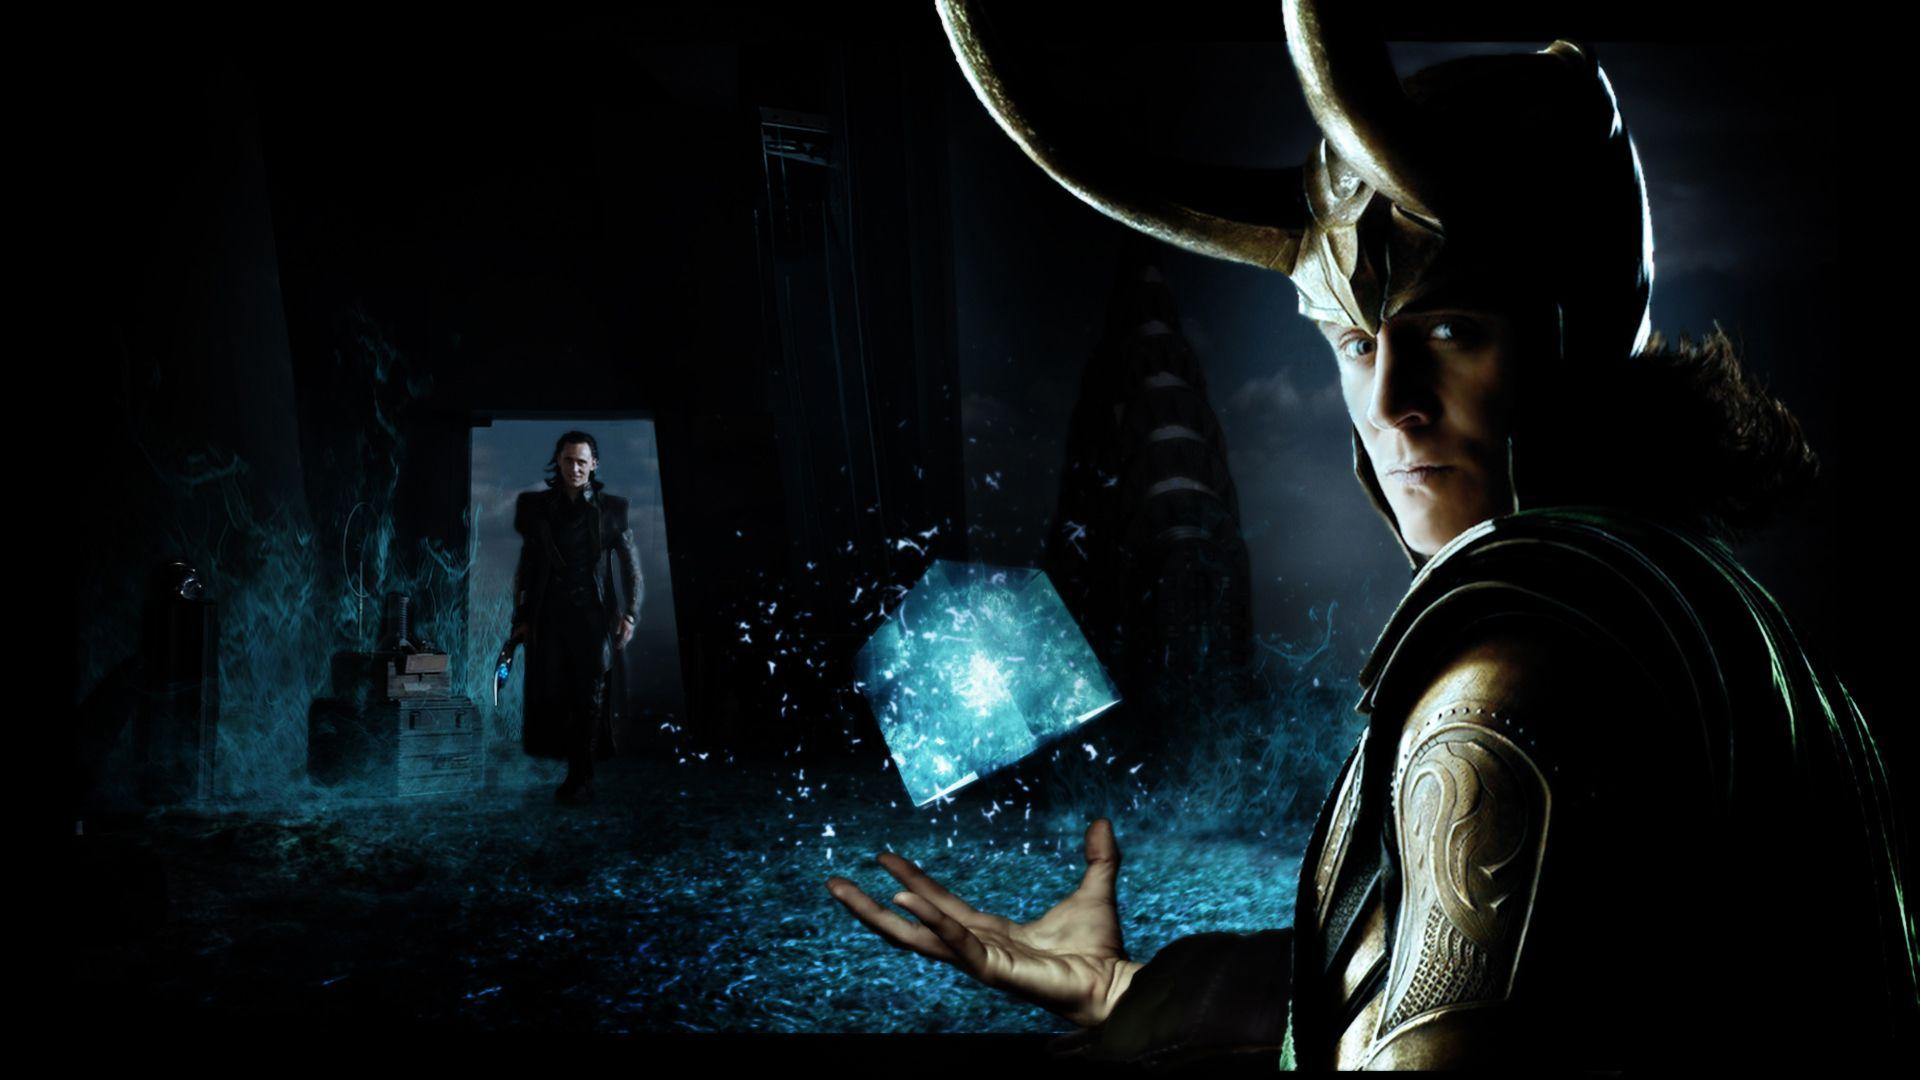 Must see Wallpaper Marvel Loki - fc9b8717010c41809cd29433ba65bf6f  Pic_77641.jpg